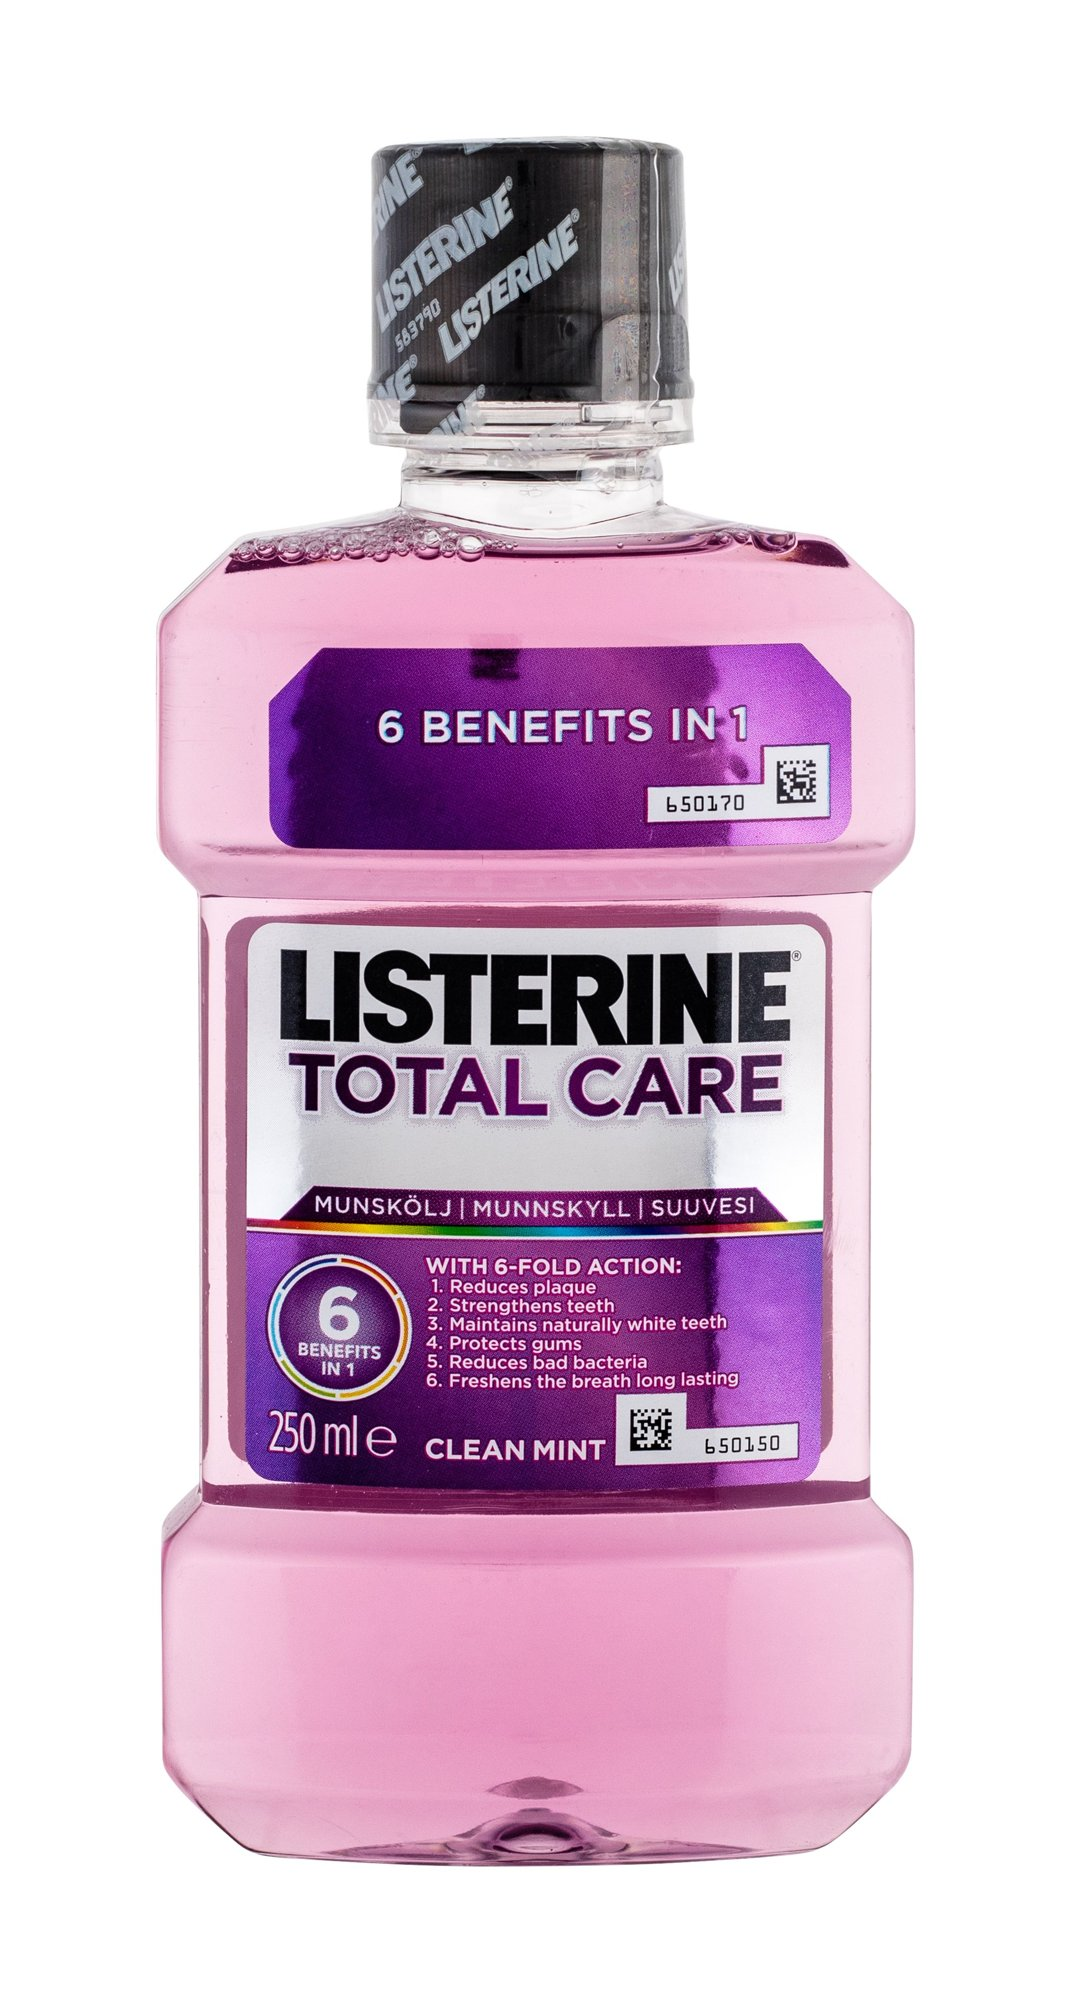 Listerine Mouthwash Mouthwash 250ml  Total Care